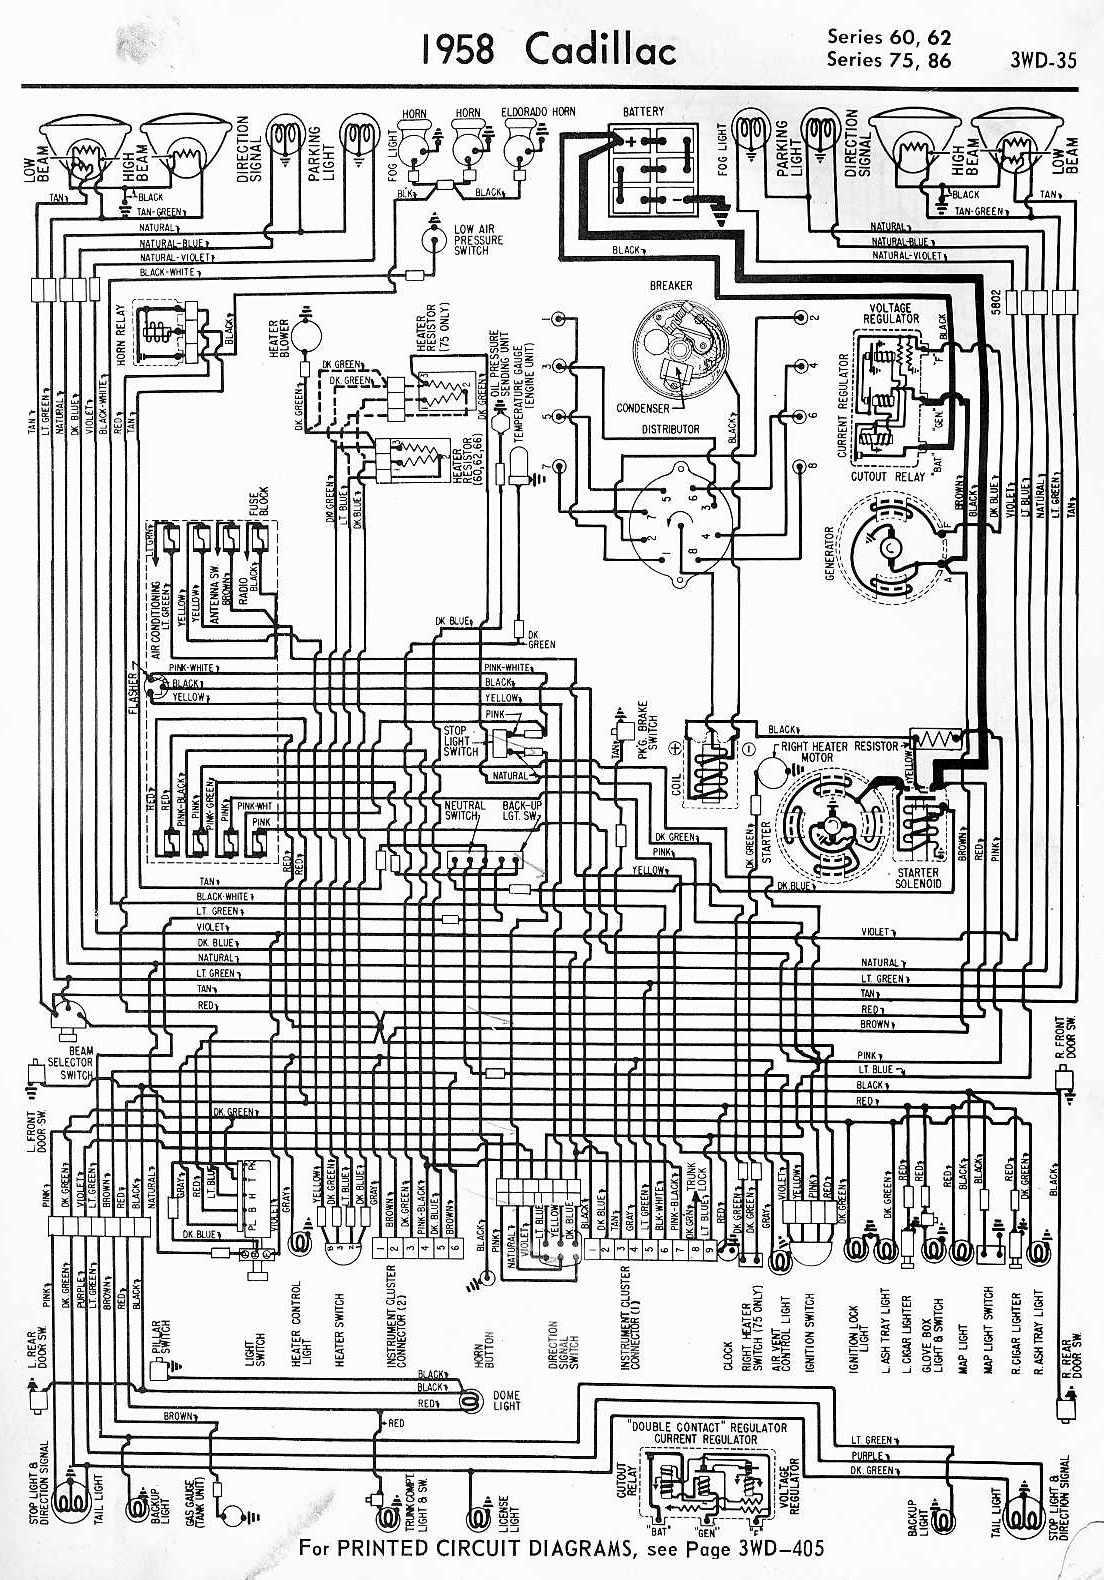 wiring diagram for a 1955 cadillac simple wiring post rh 20 asiagourmet igb de 1956 cadillac 1969 cadillac [ 1104 x 1580 Pixel ]